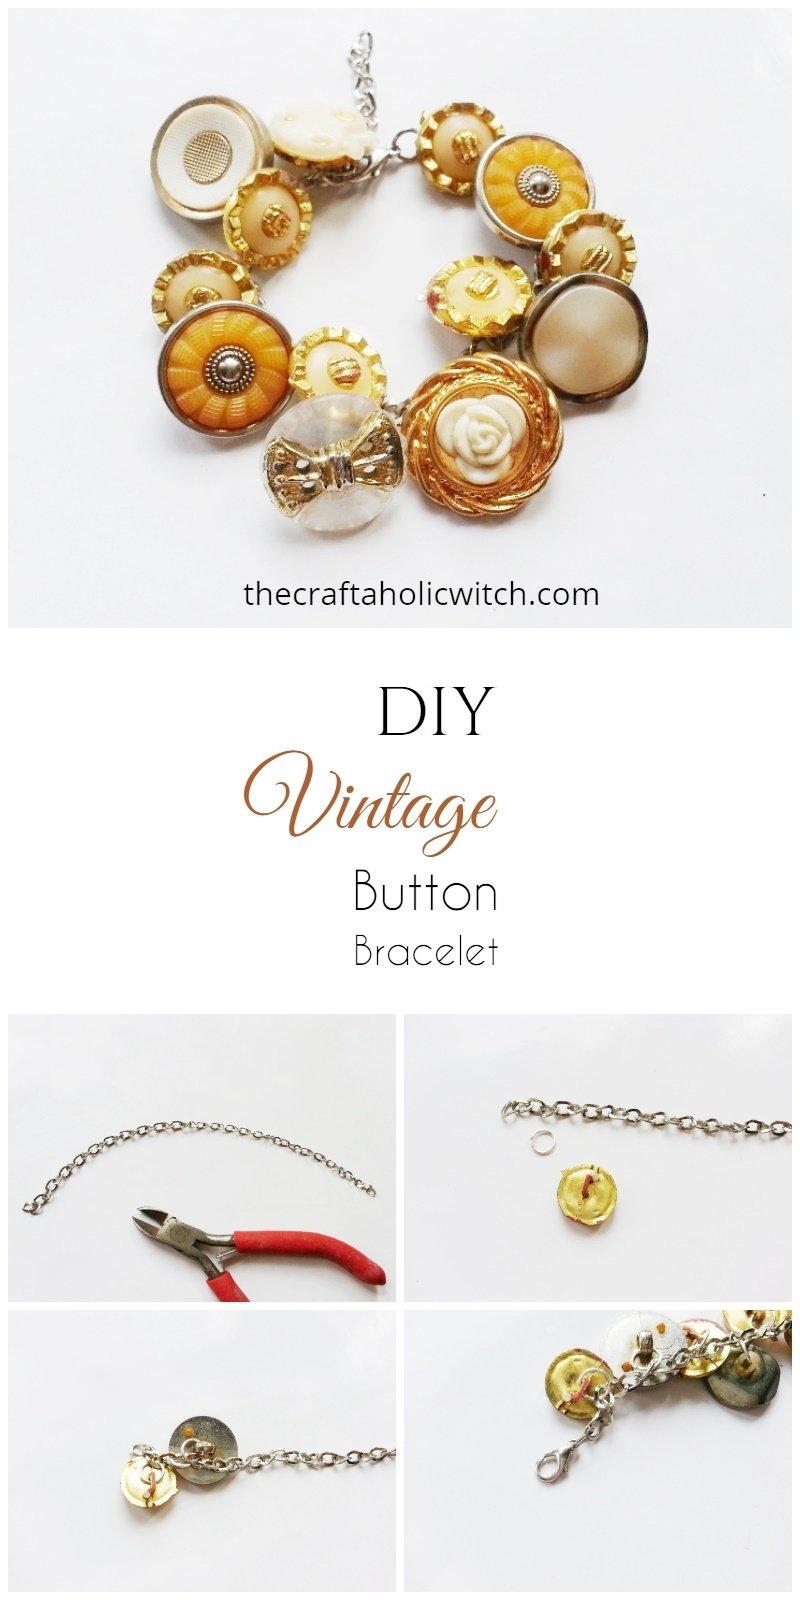 DIY Vintage Button Bracelet